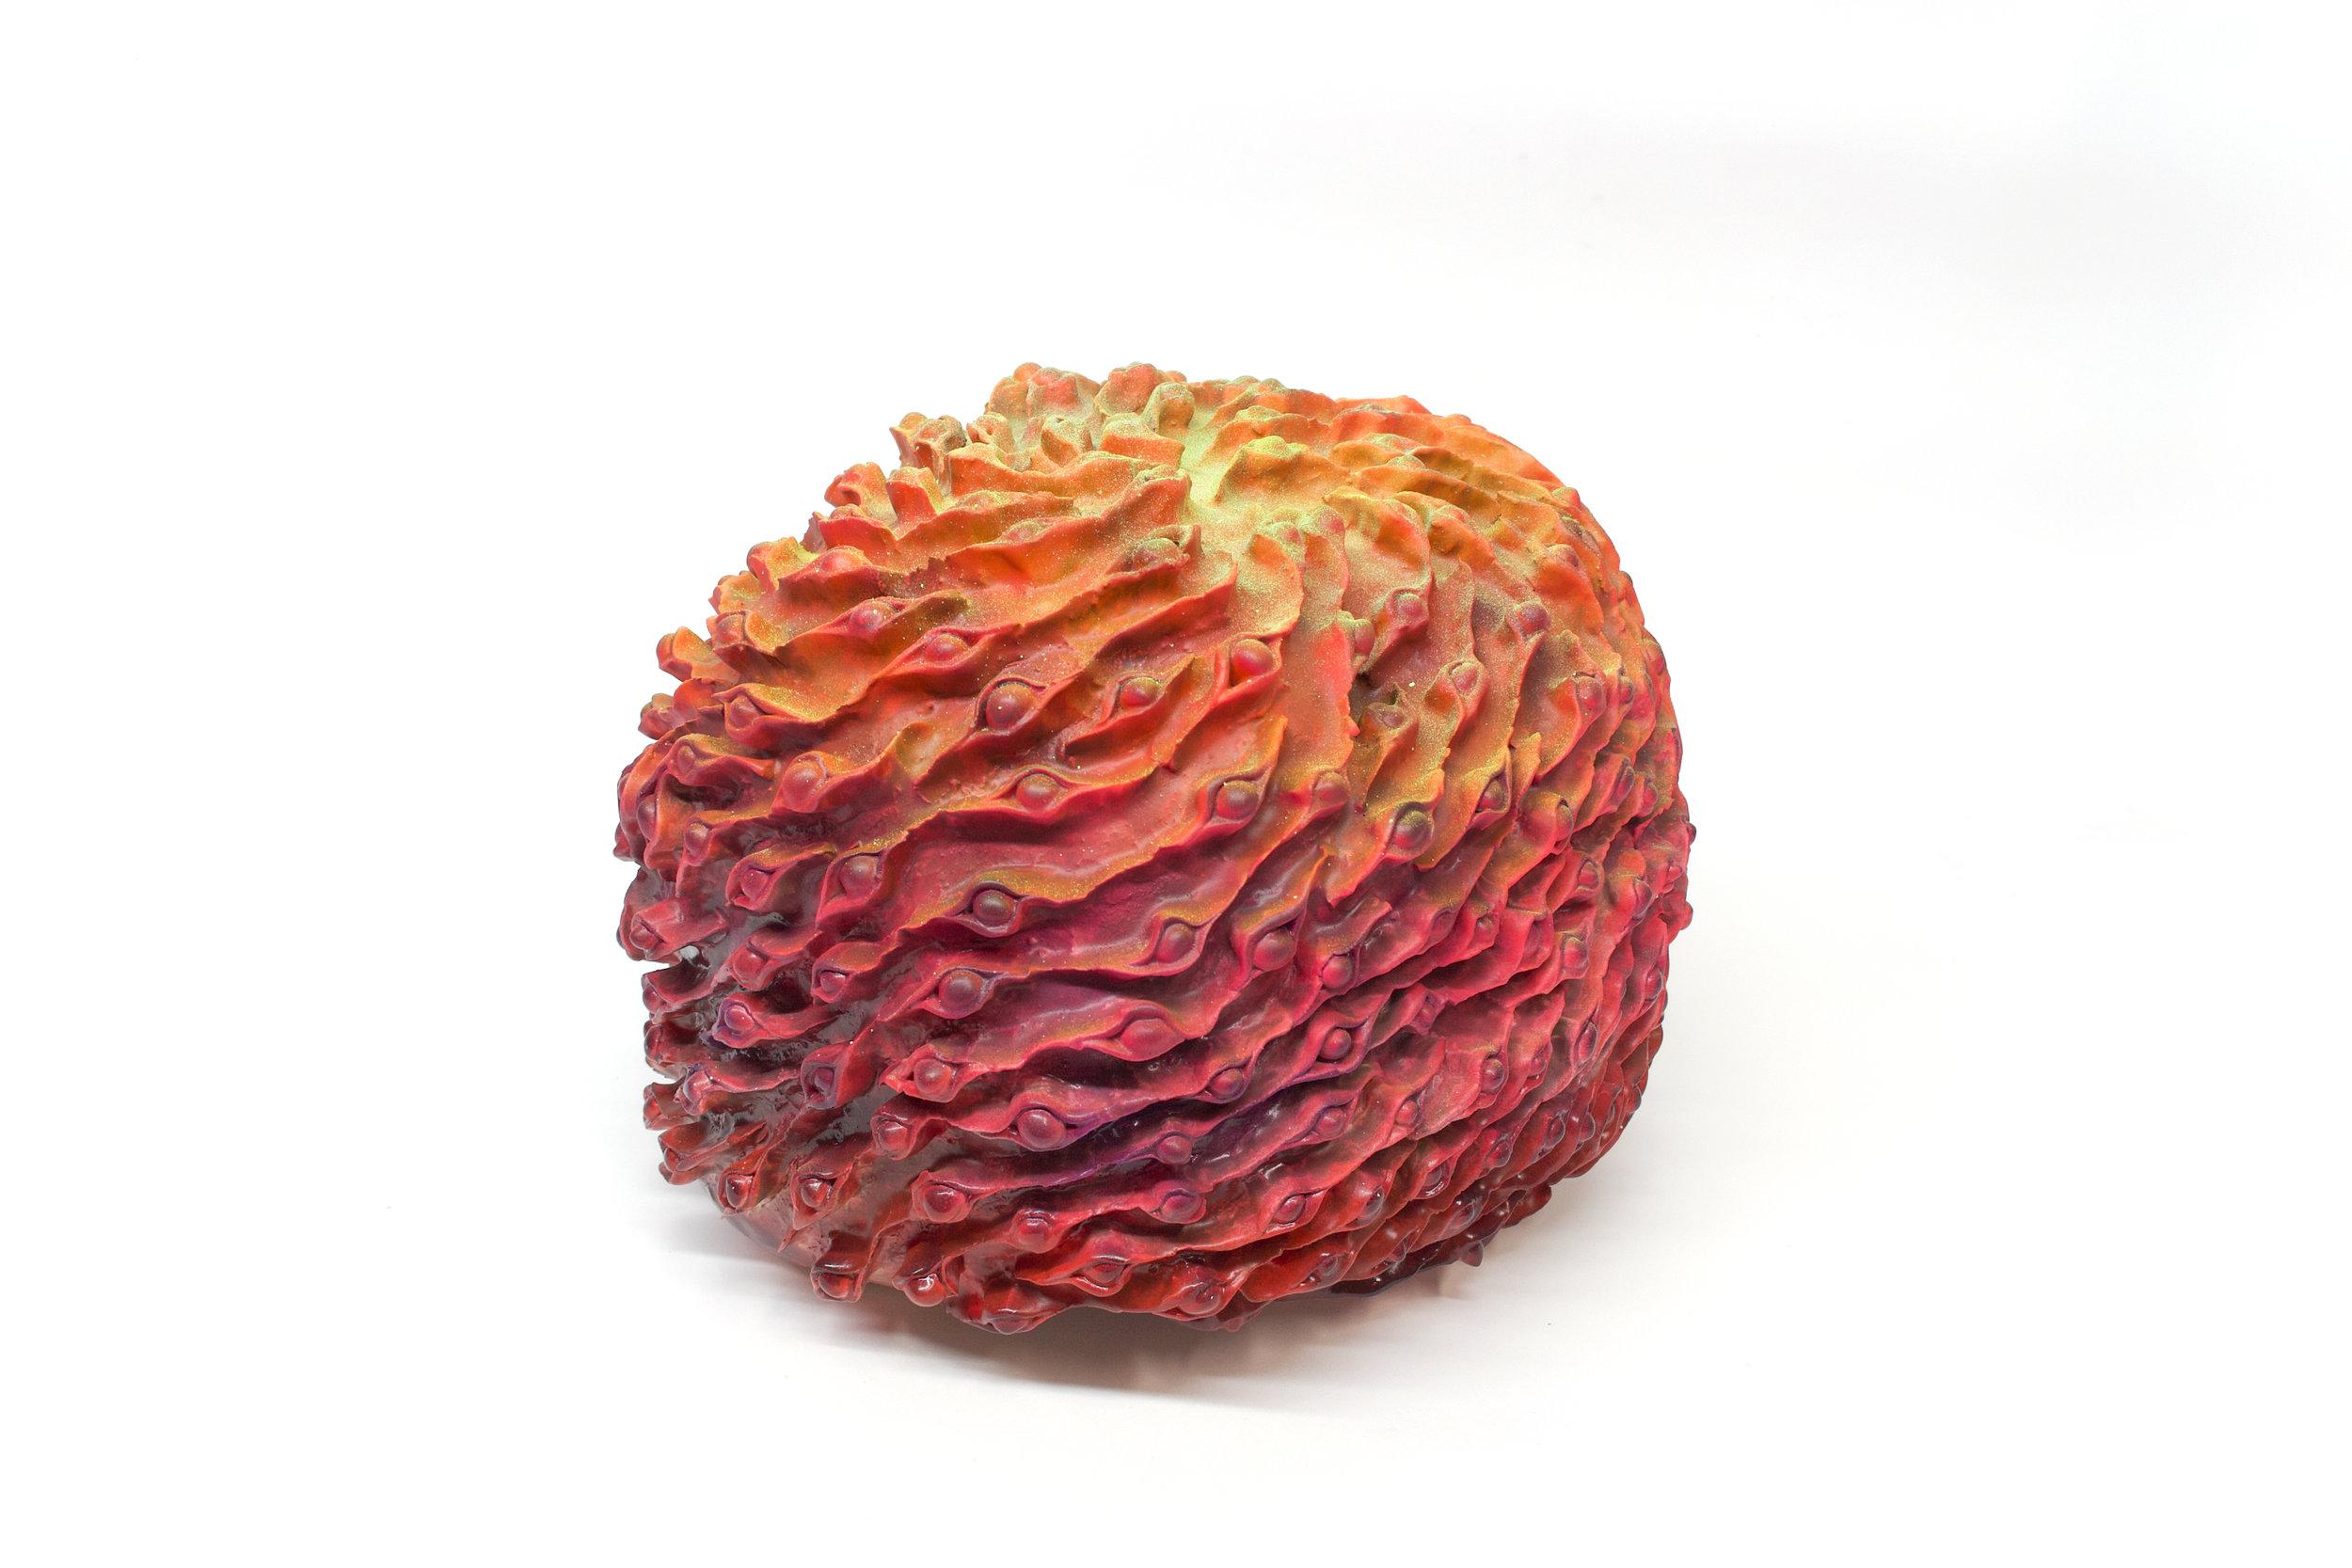 "Philippe Caron Lefebvre,  Maëltrom  2019, ceramic, glaze and paint, 31 x 36 x 36 cm (12"" x 14"" x 14"")"